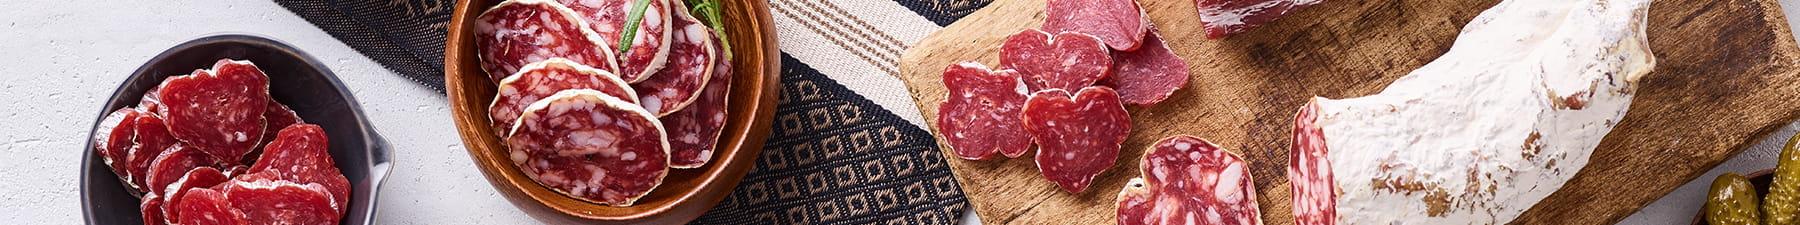 Sliced salami on wooden board